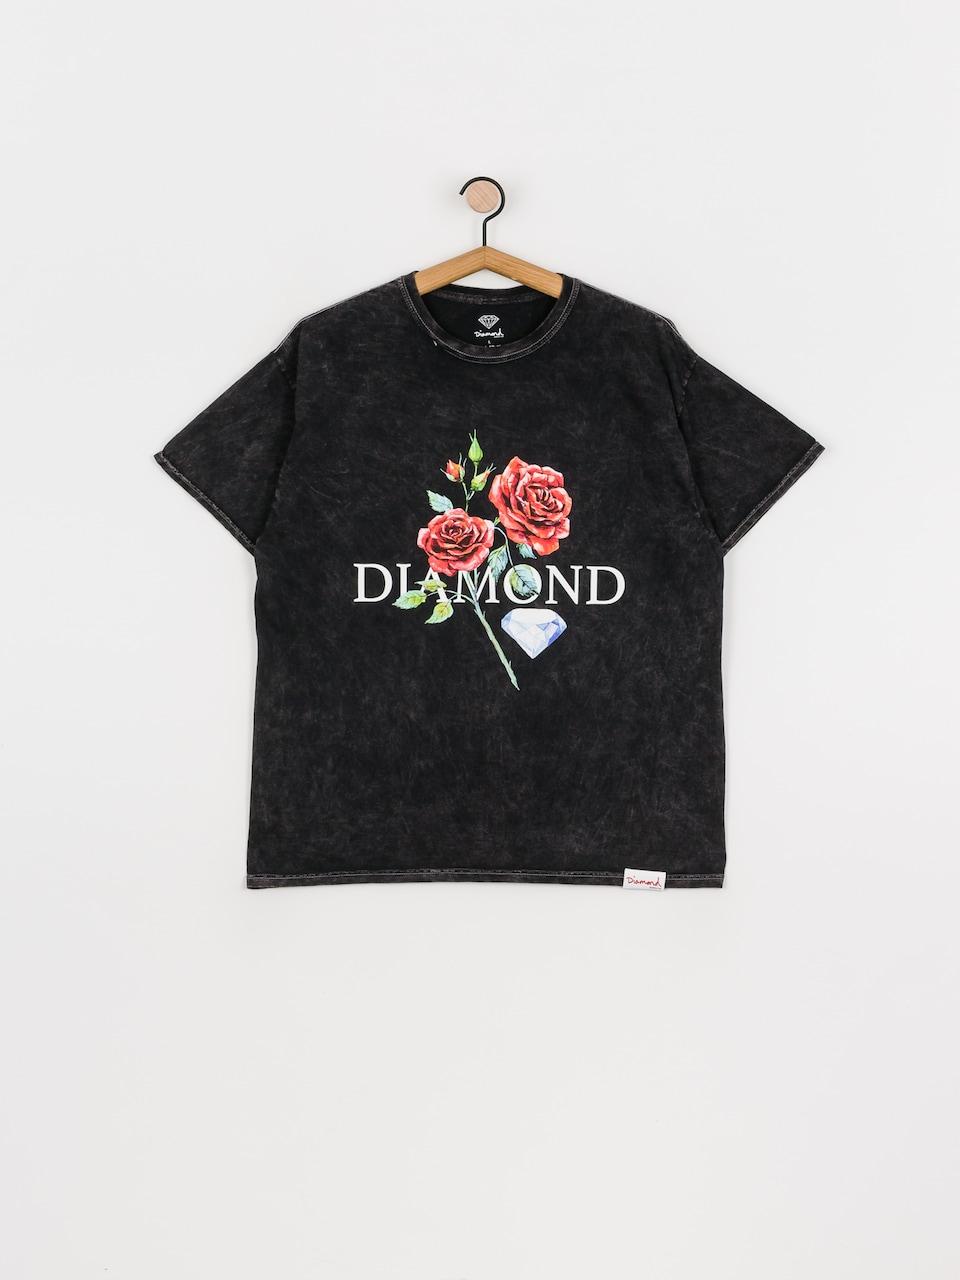 Men/'s Black Block Roses Tank Top T Shirt RDAM-268 New Diamond Supply Co